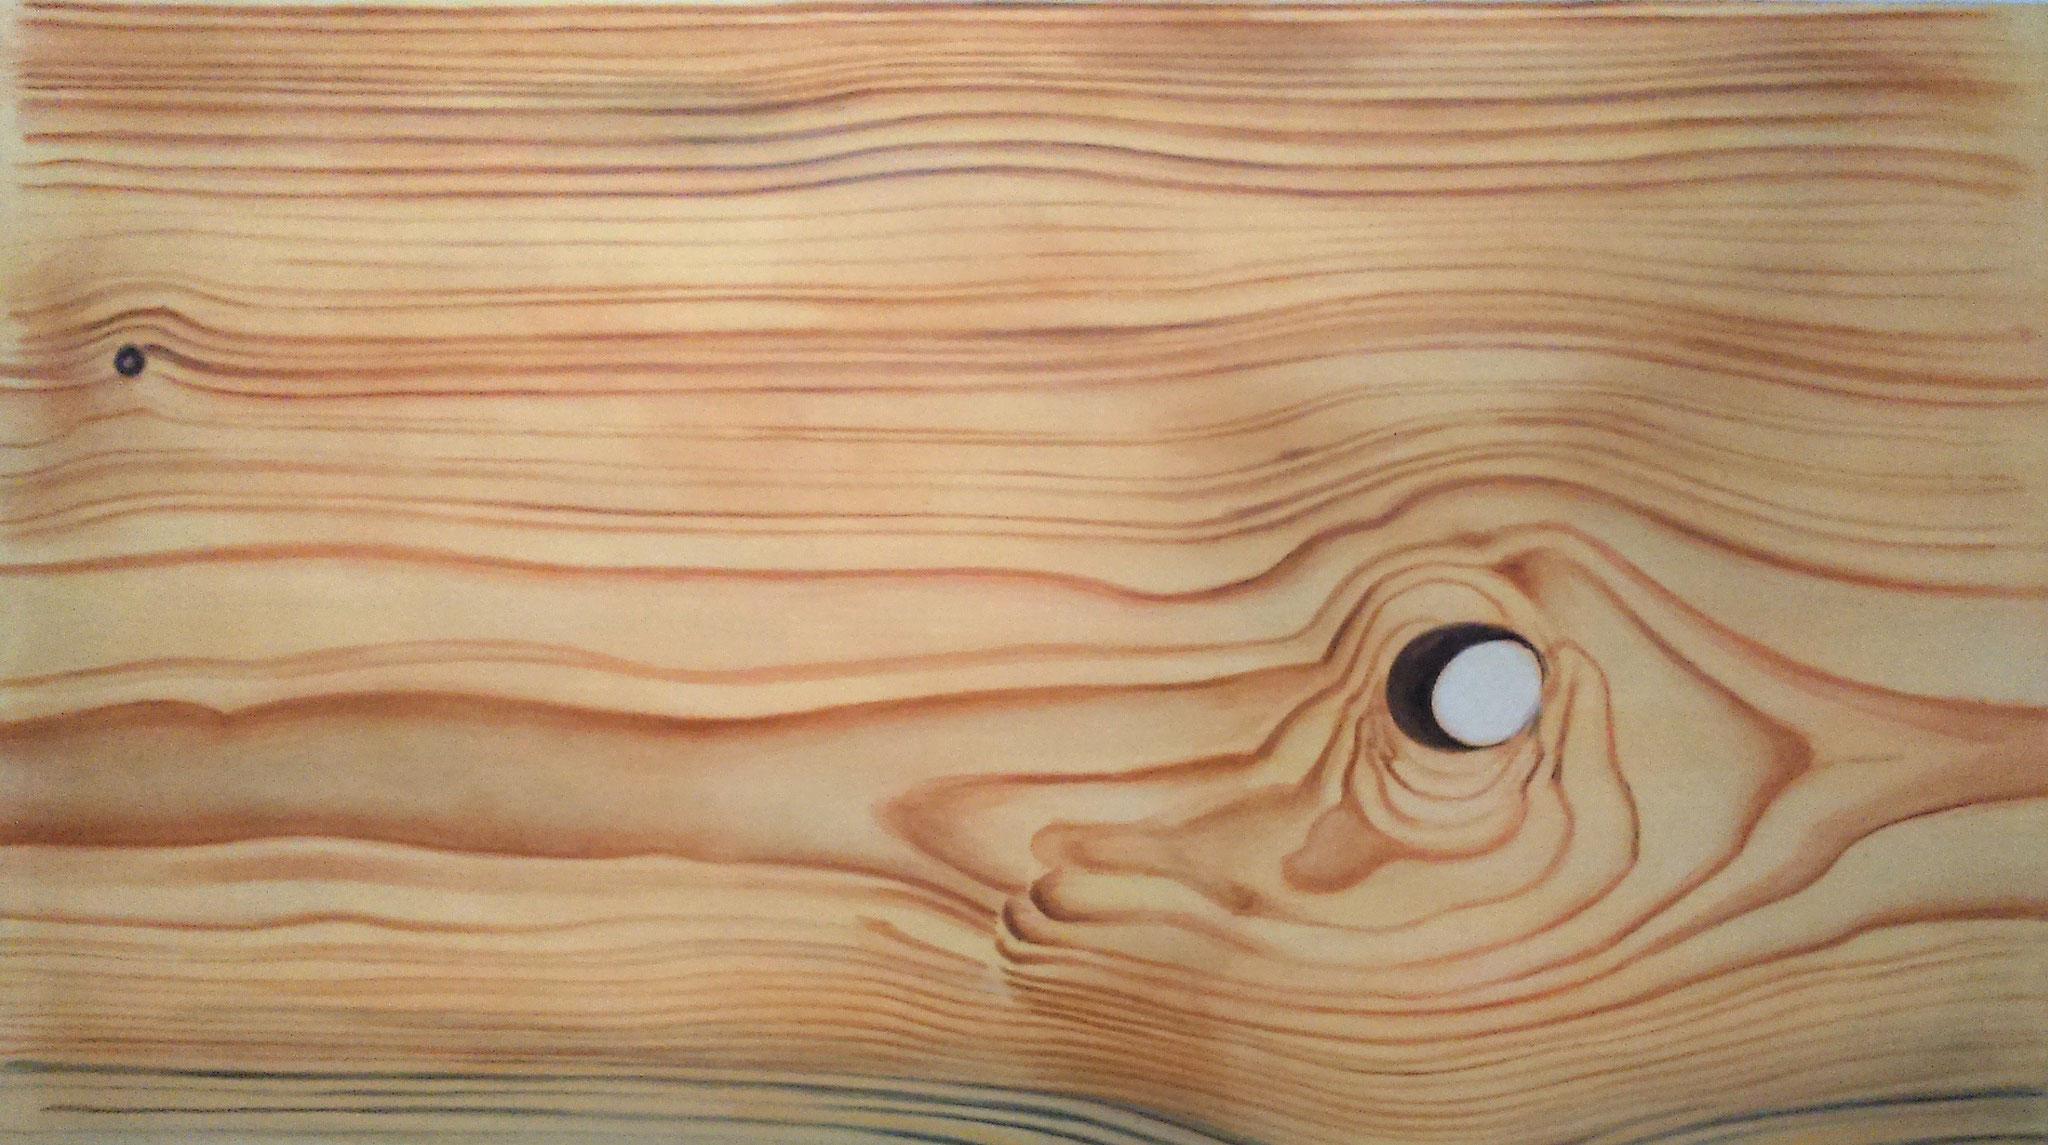 Holzimitation, Akryl auf Leinwand, 85 x 126 cm